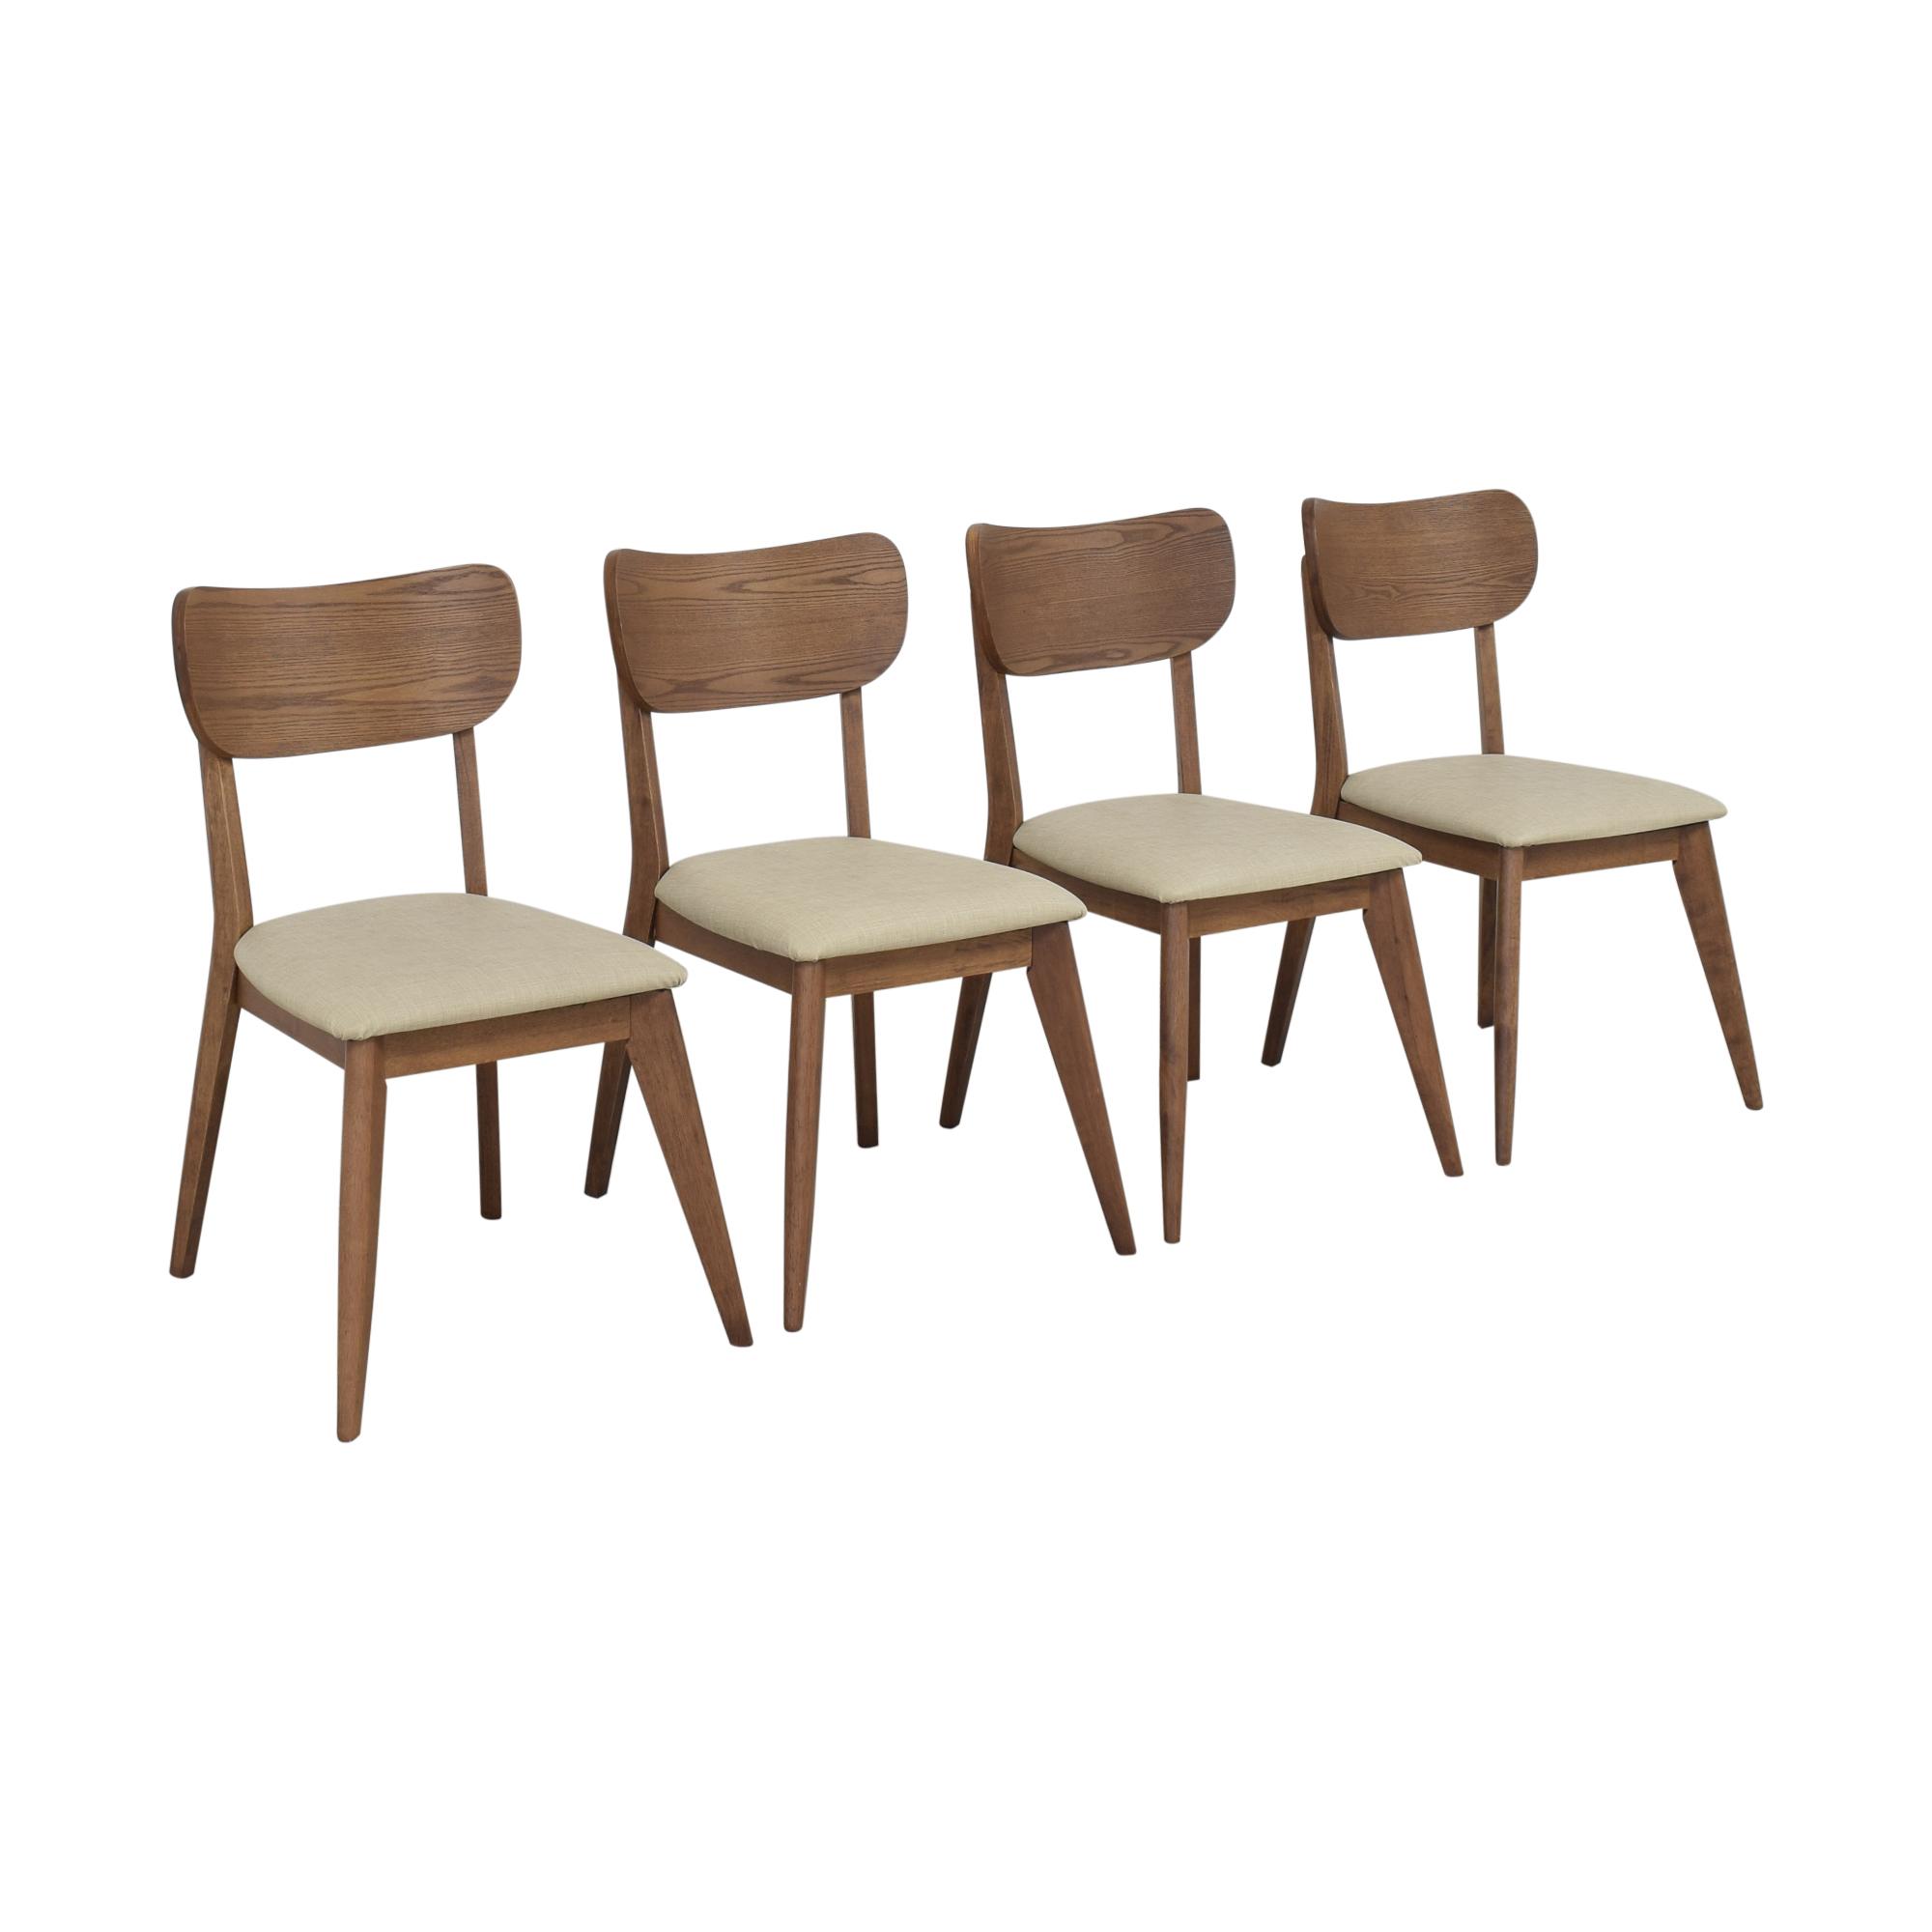 AllModern AllModern Mid-Century Modern Style Dining Chairs on sale